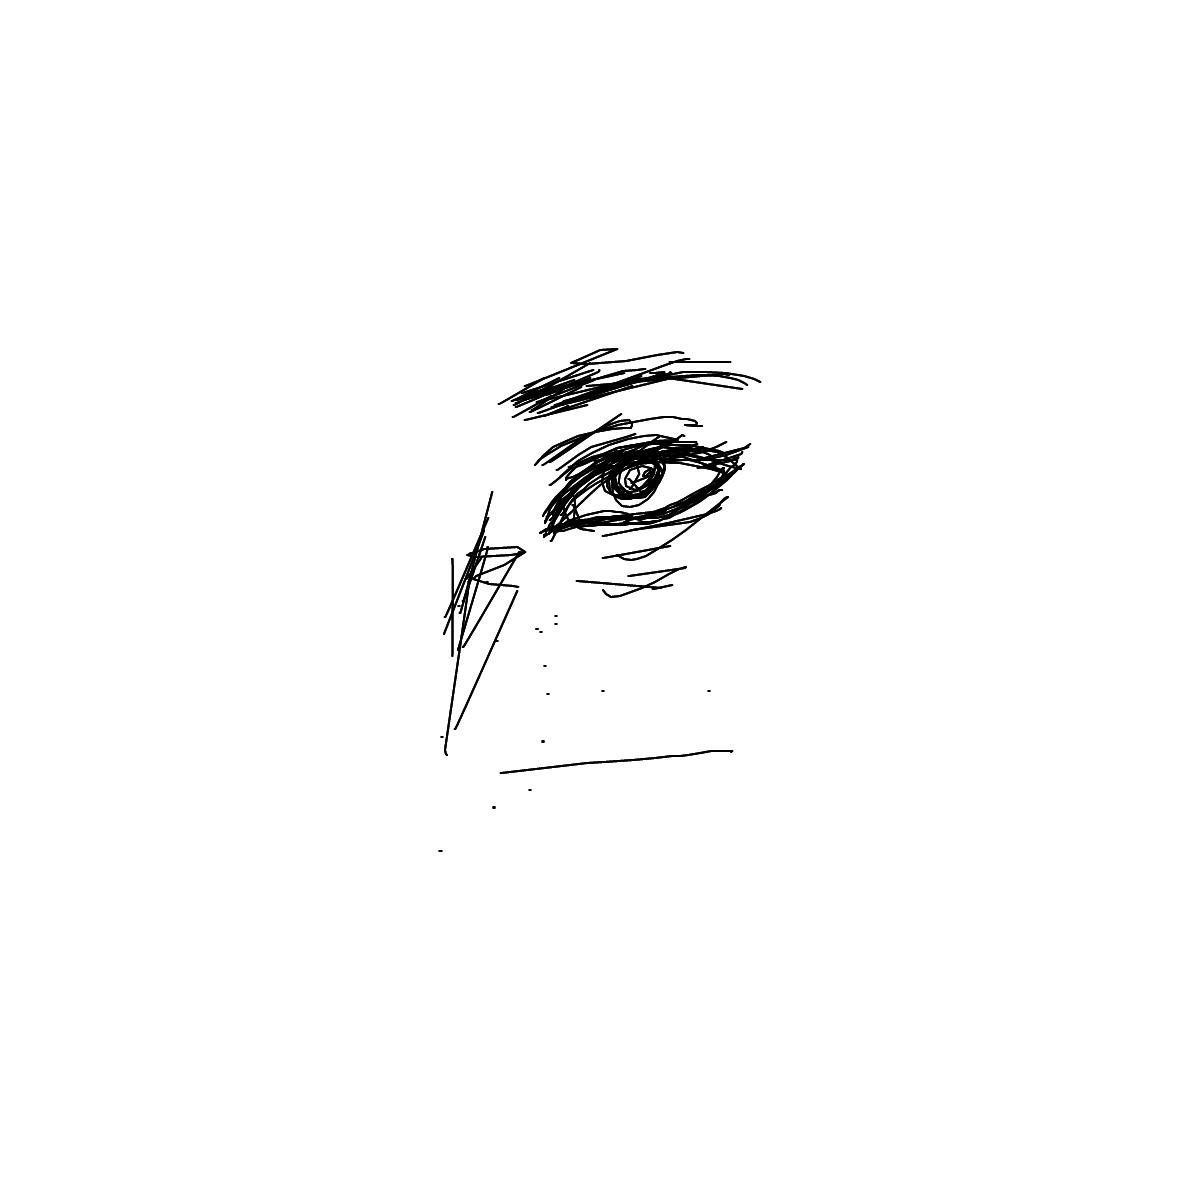 BAAAM drawing#501 lat:46.3255958557128900lng: -63.2139663696289060